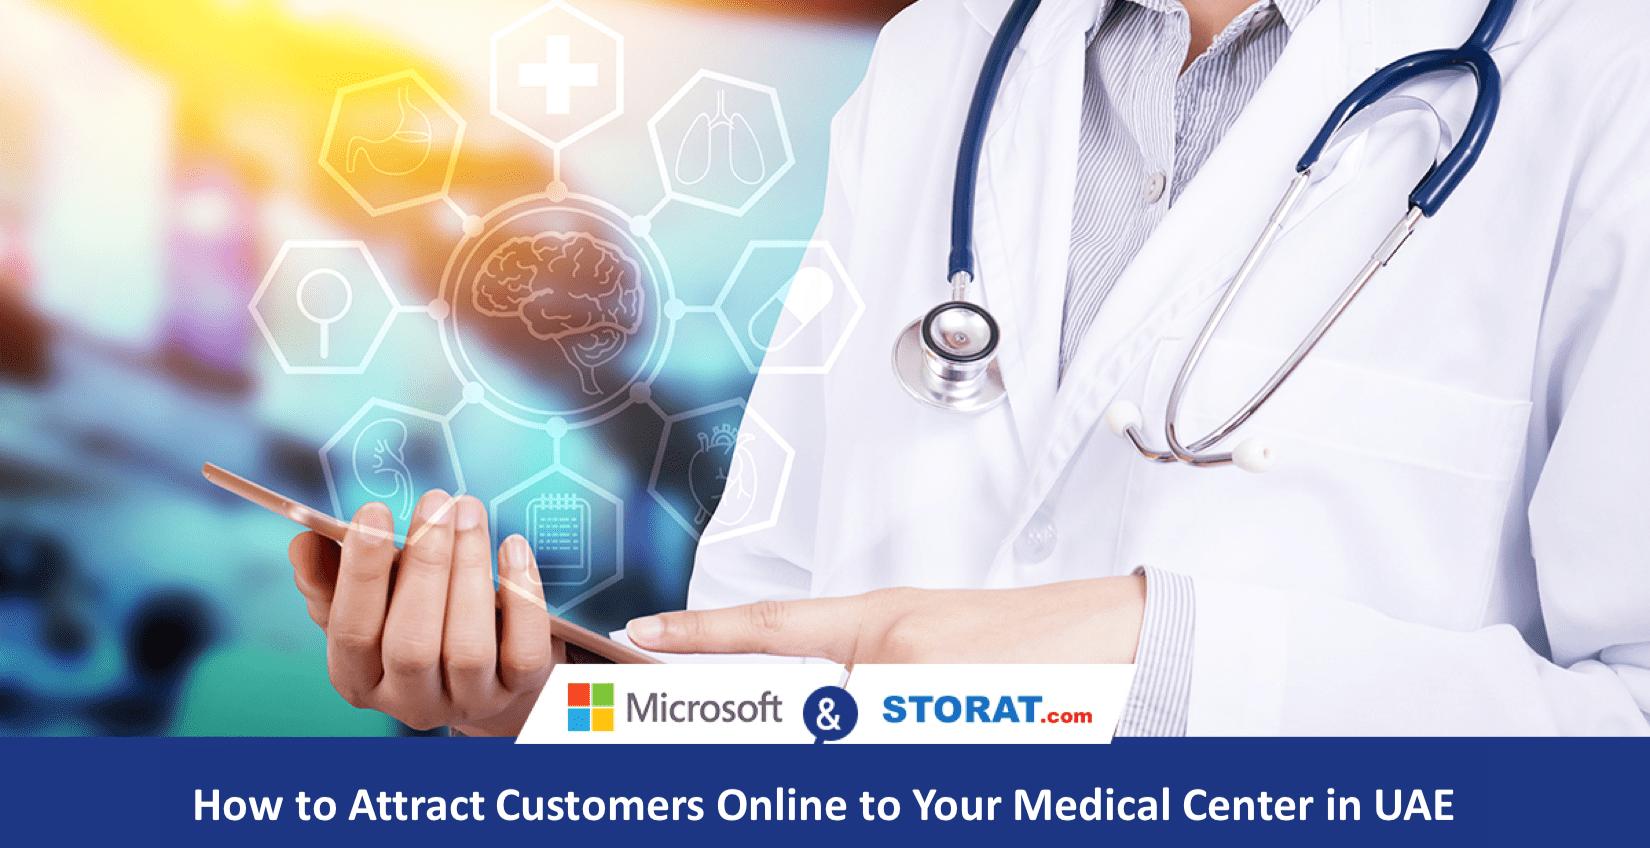 Free Digital Marketing Workshop for Medical Centers in Dubai